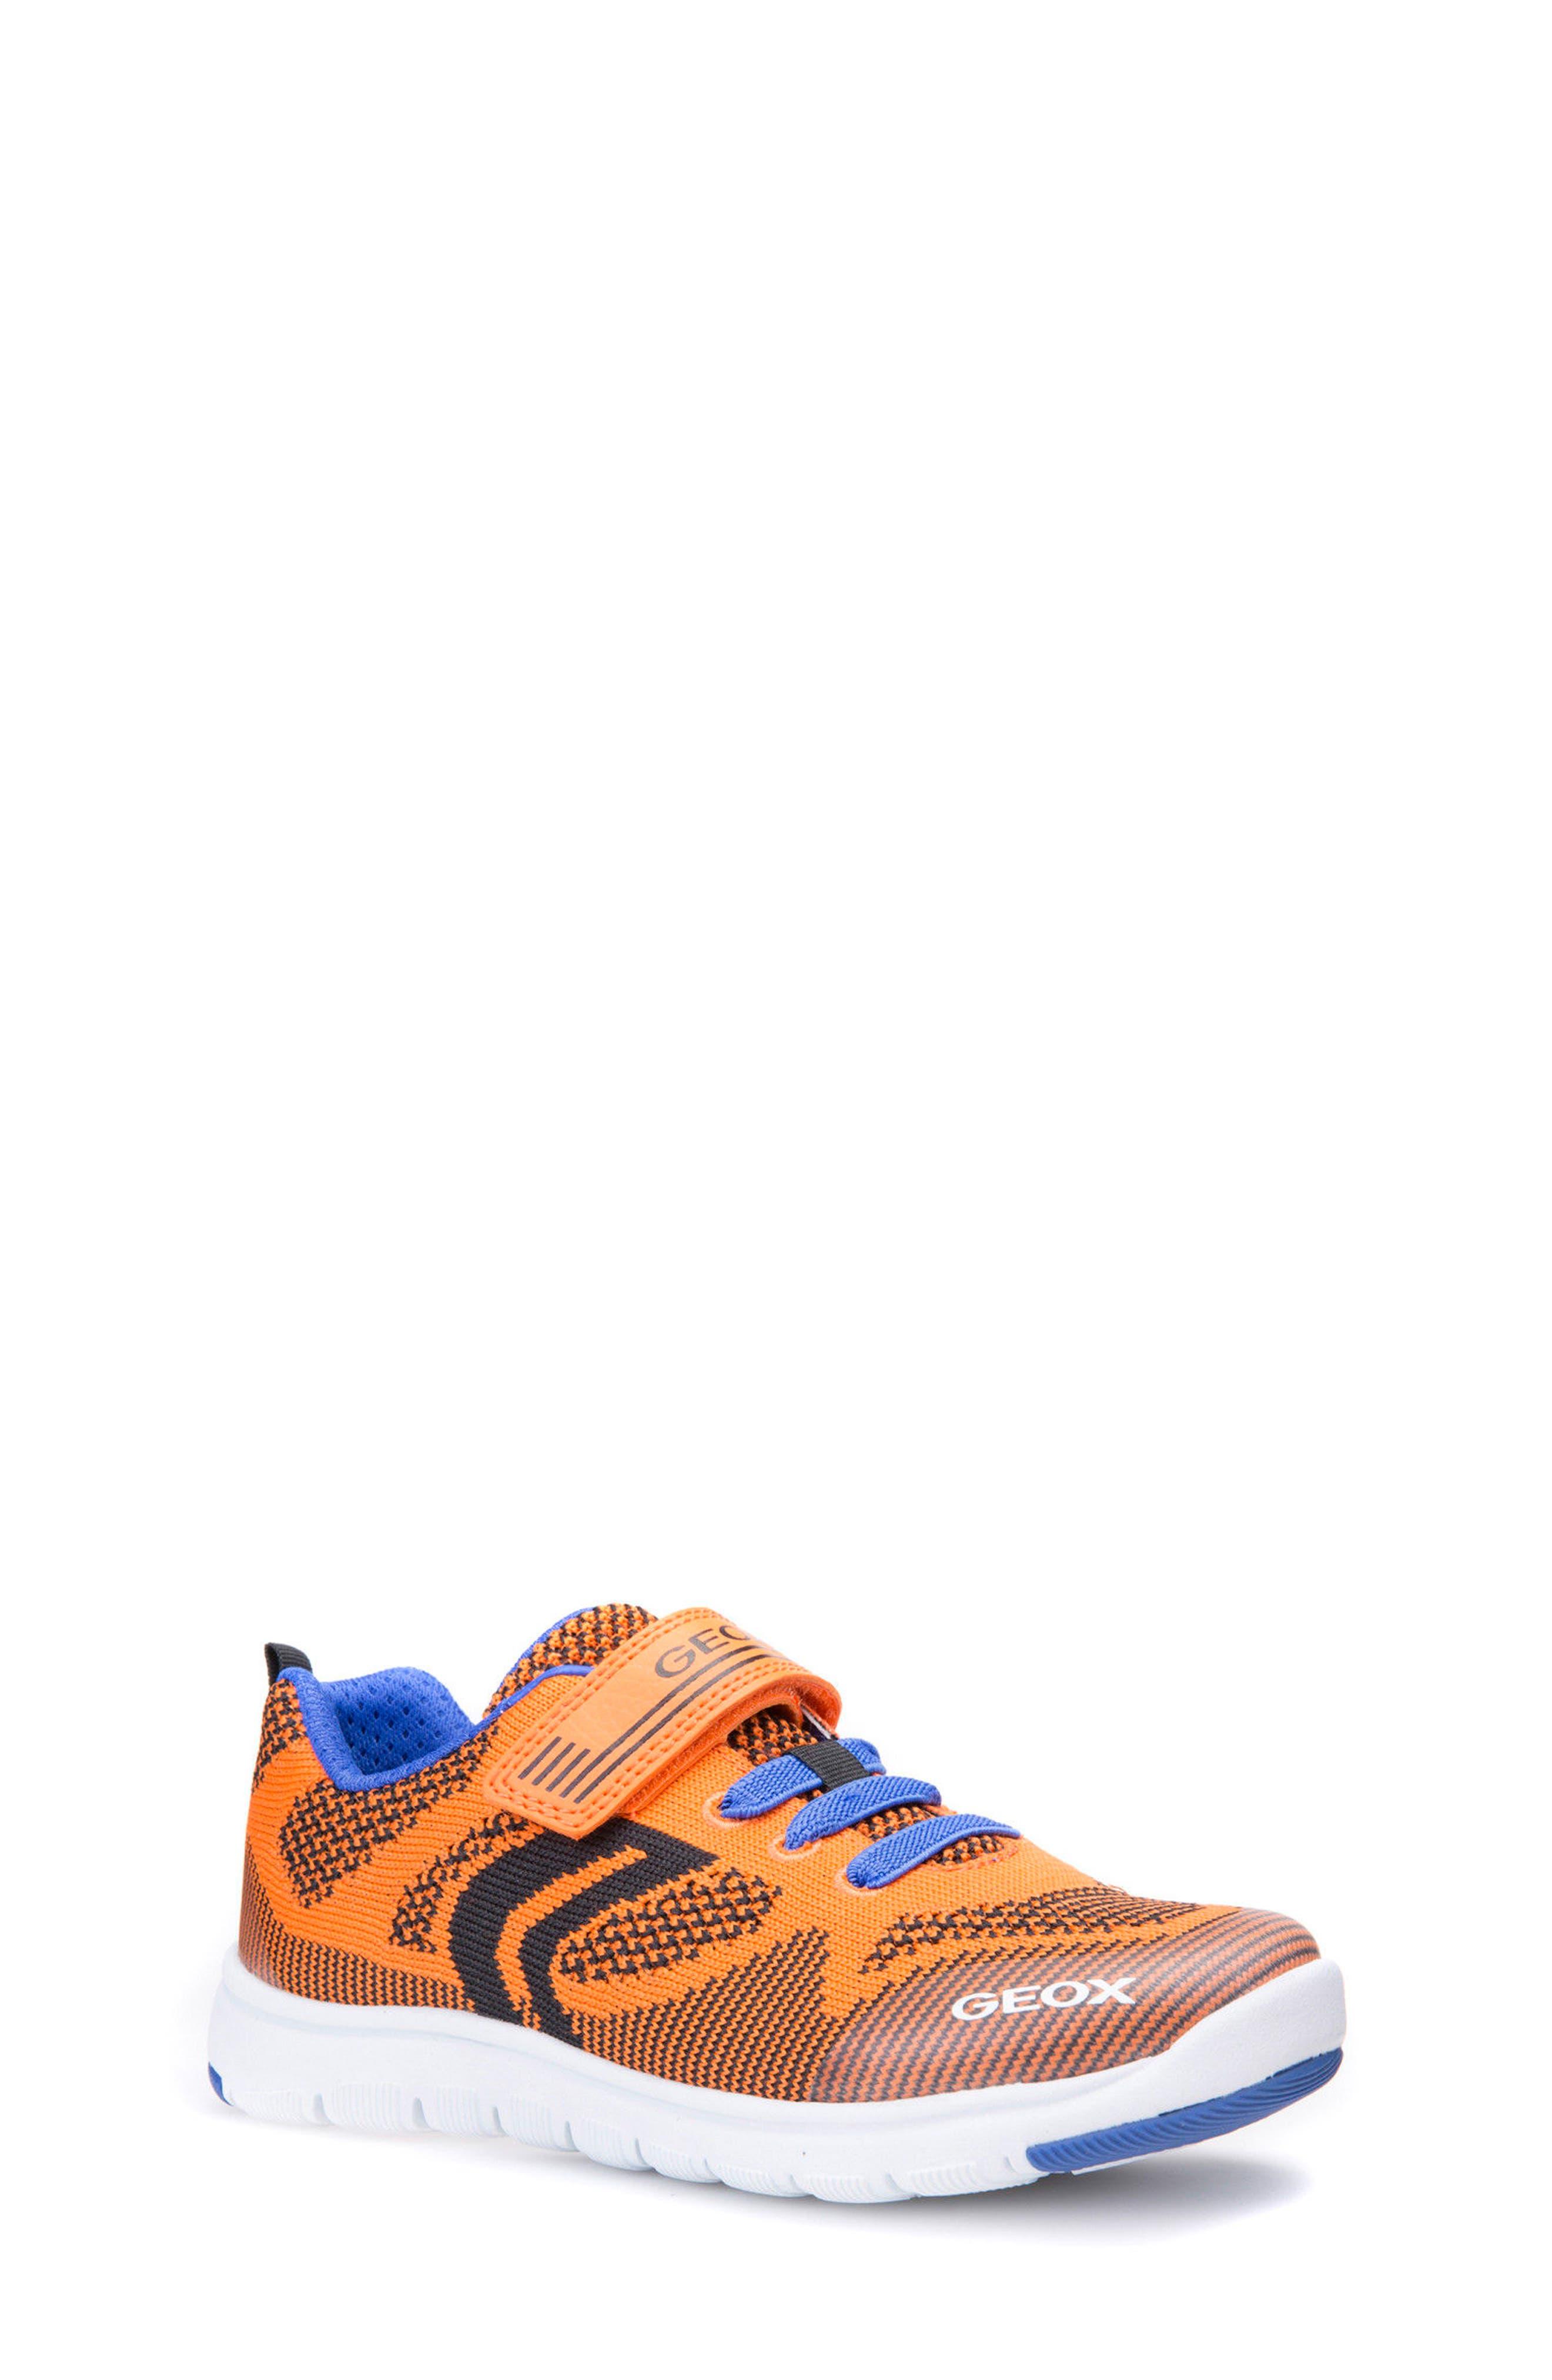 Xunday Low Top Woven Sneaker,                             Main thumbnail 1, color,                             Orange/ Royal